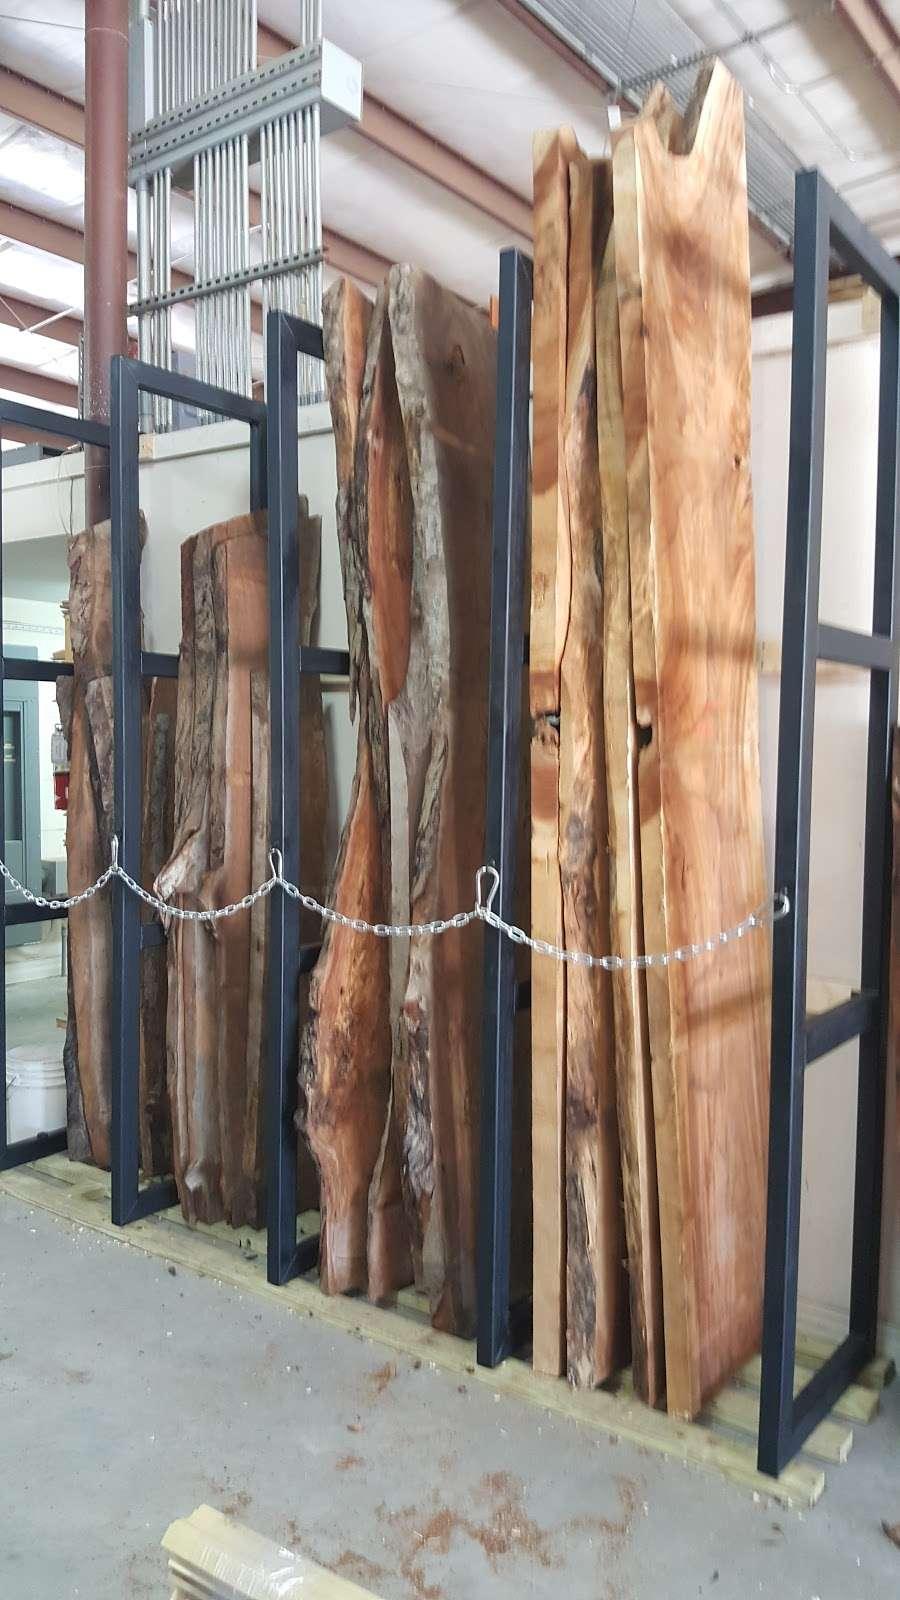 Hardwood Lumber & Millwork - store  | Photo 9 of 10 | Address: 4316 Wallace Rd, Lakeland, FL 33812, USA | Phone: (863) 646-8681